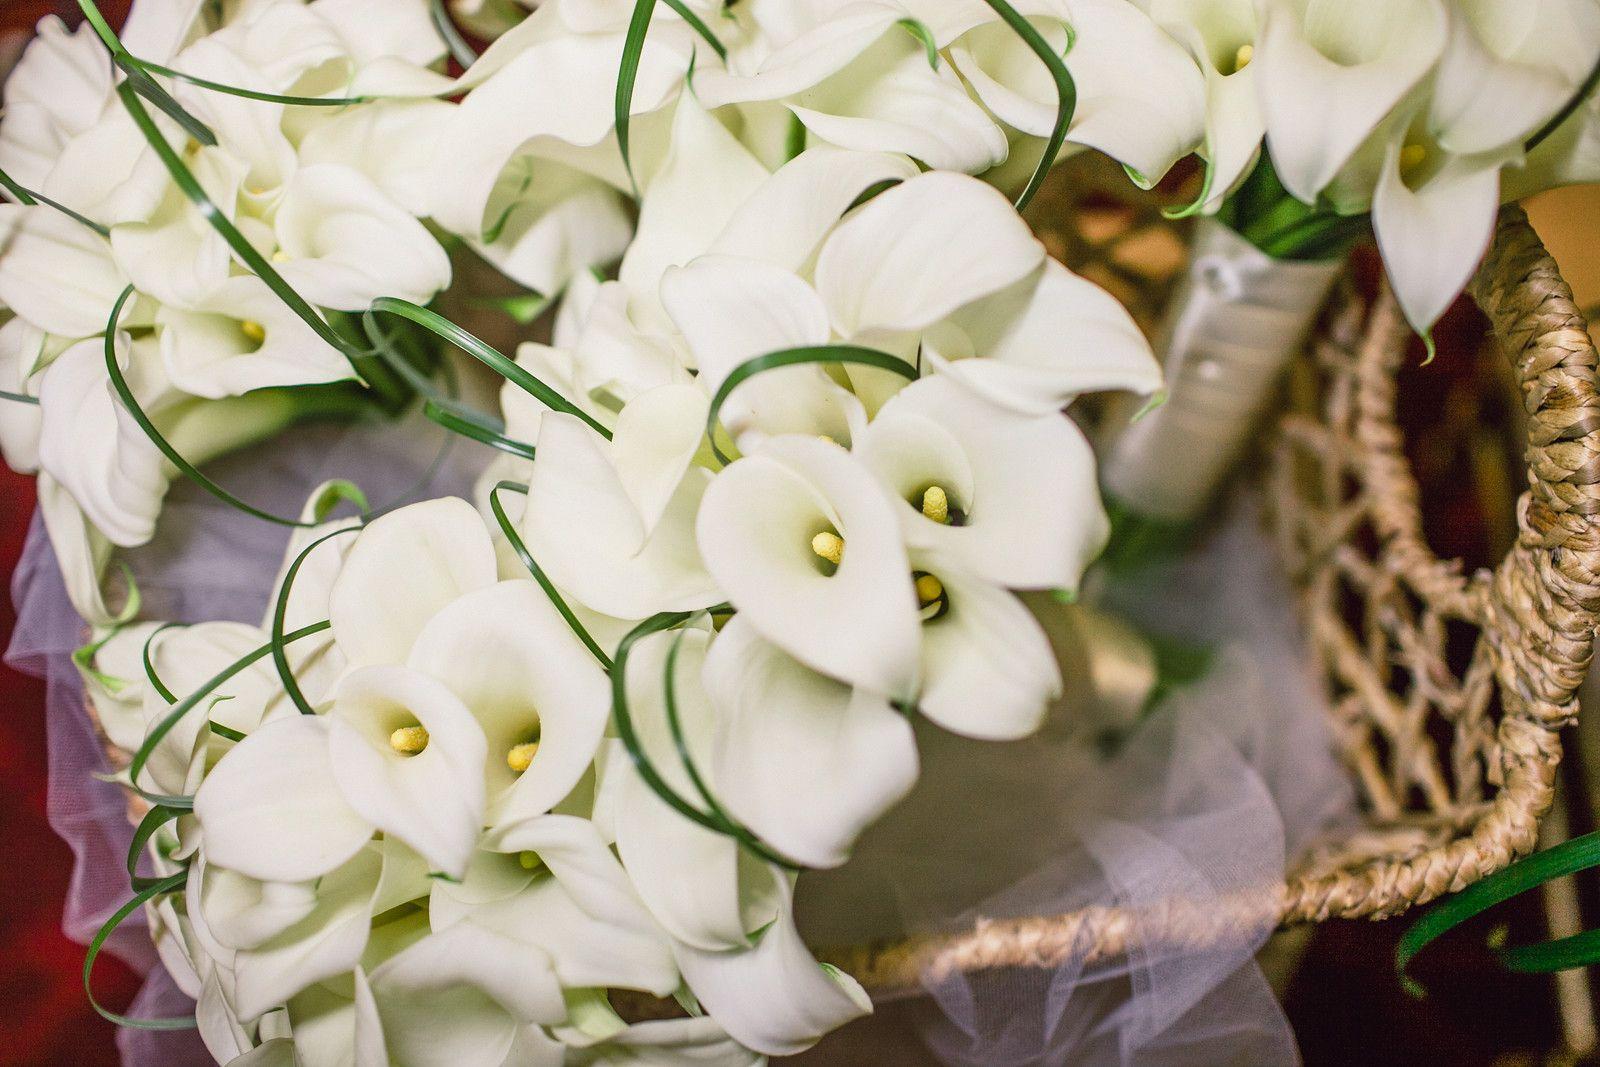 Calla Lily bouquets for bridesmaids by Dezign Shop